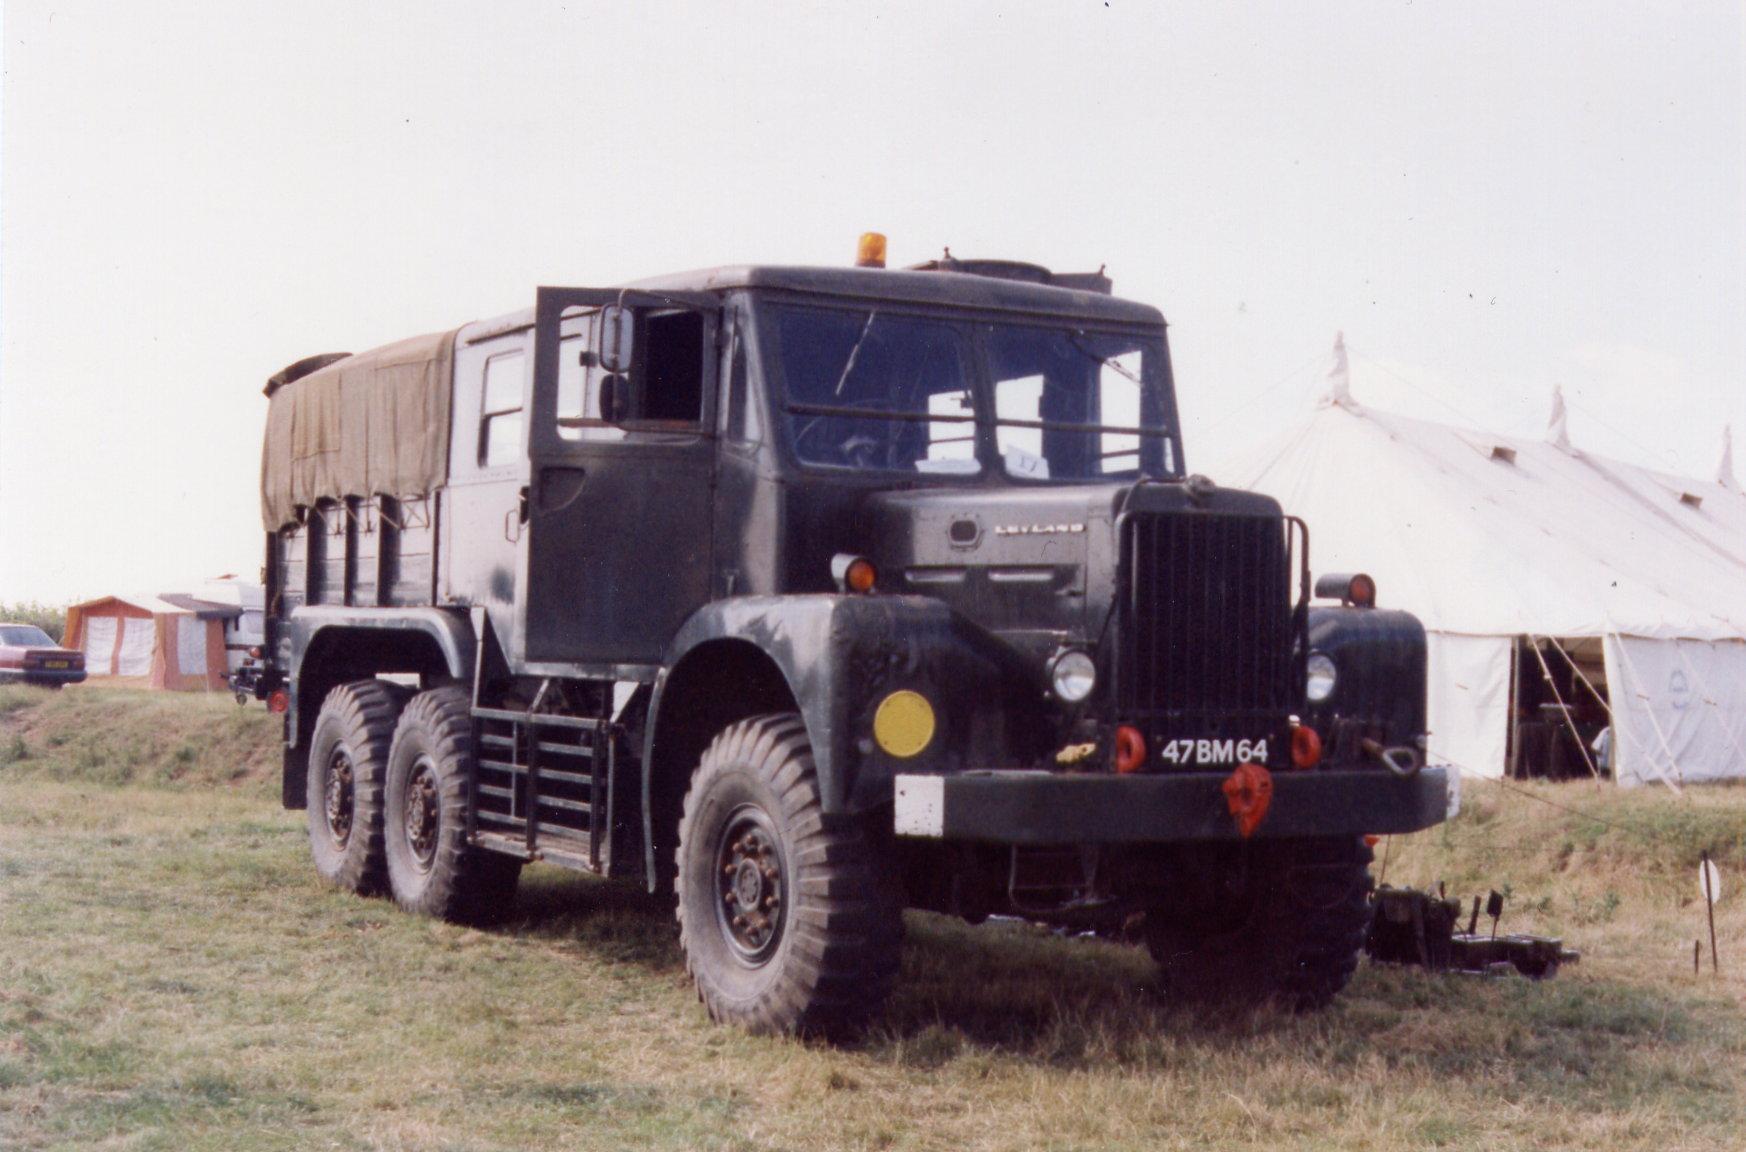 leyland-martian-10ton-artillery-tractor-47-bm-64.jpg